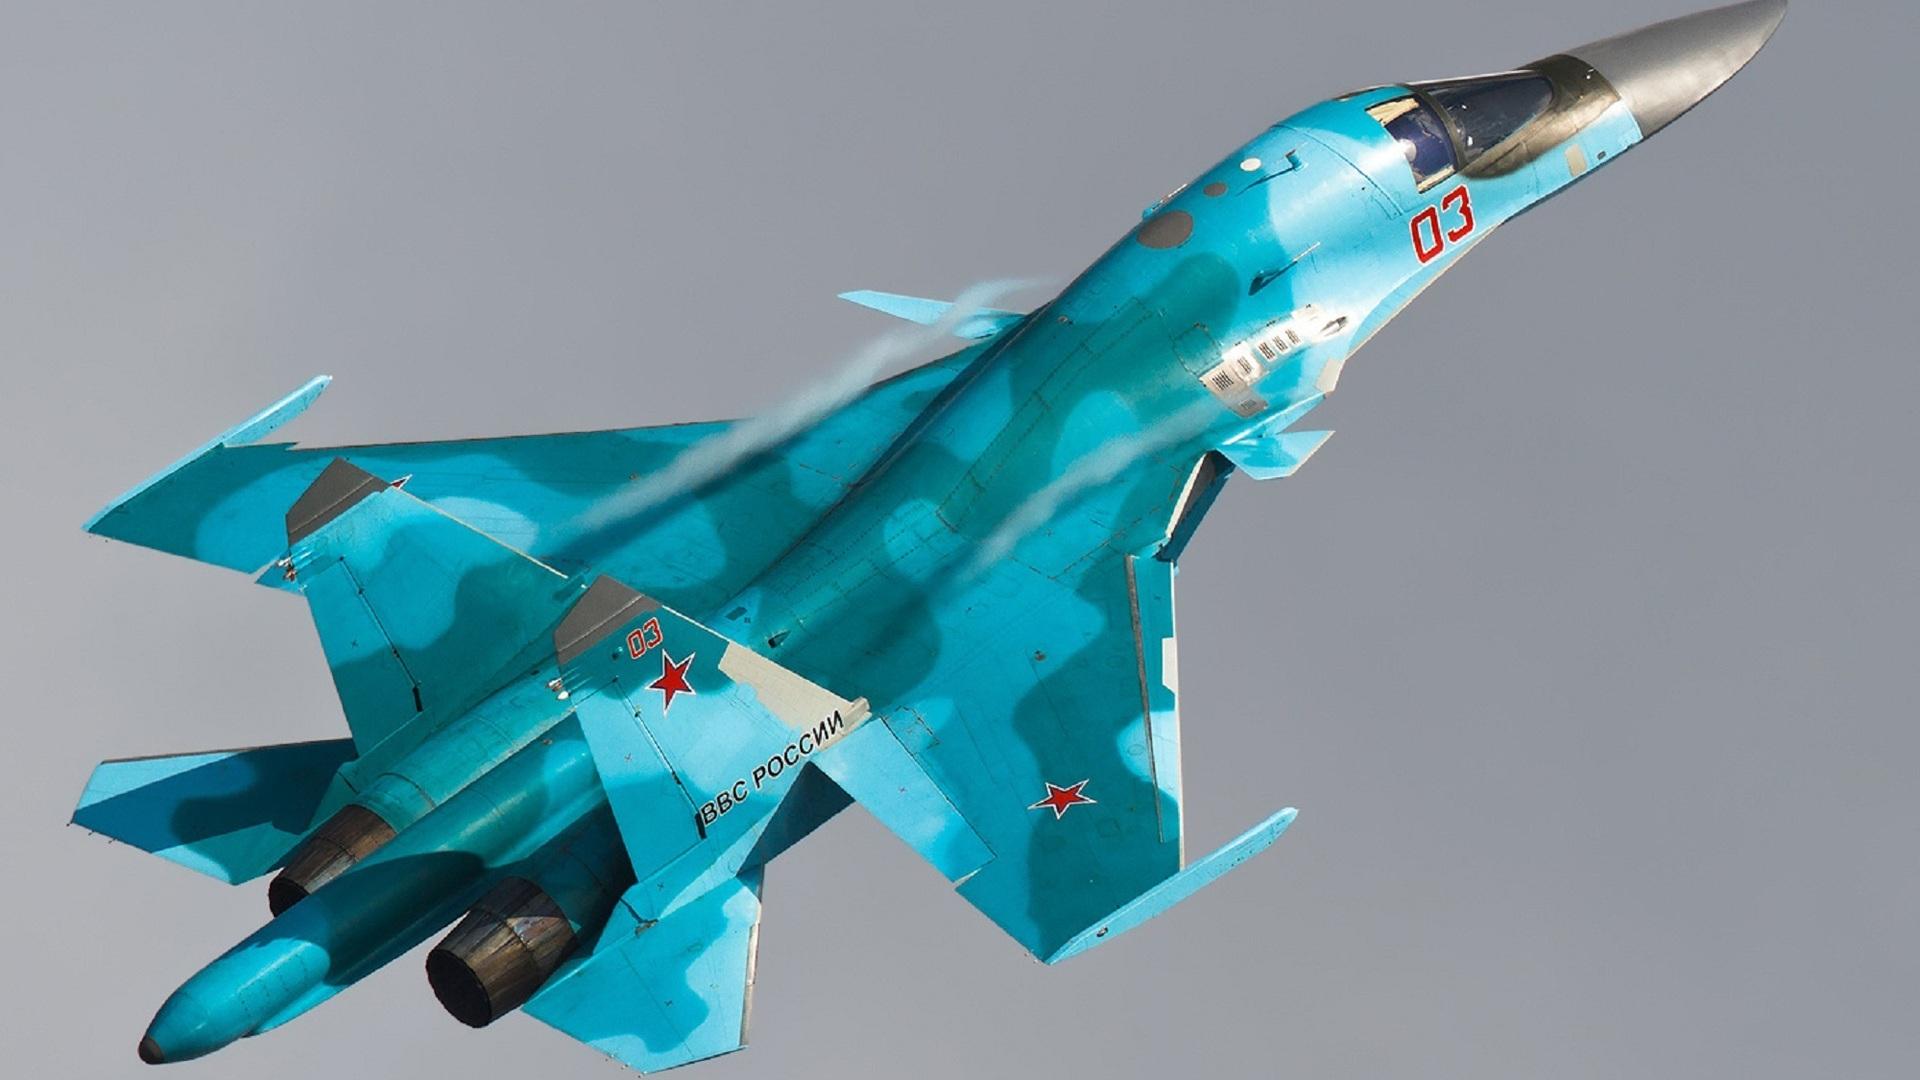 Su 34 (航空機)の画像 p1_32